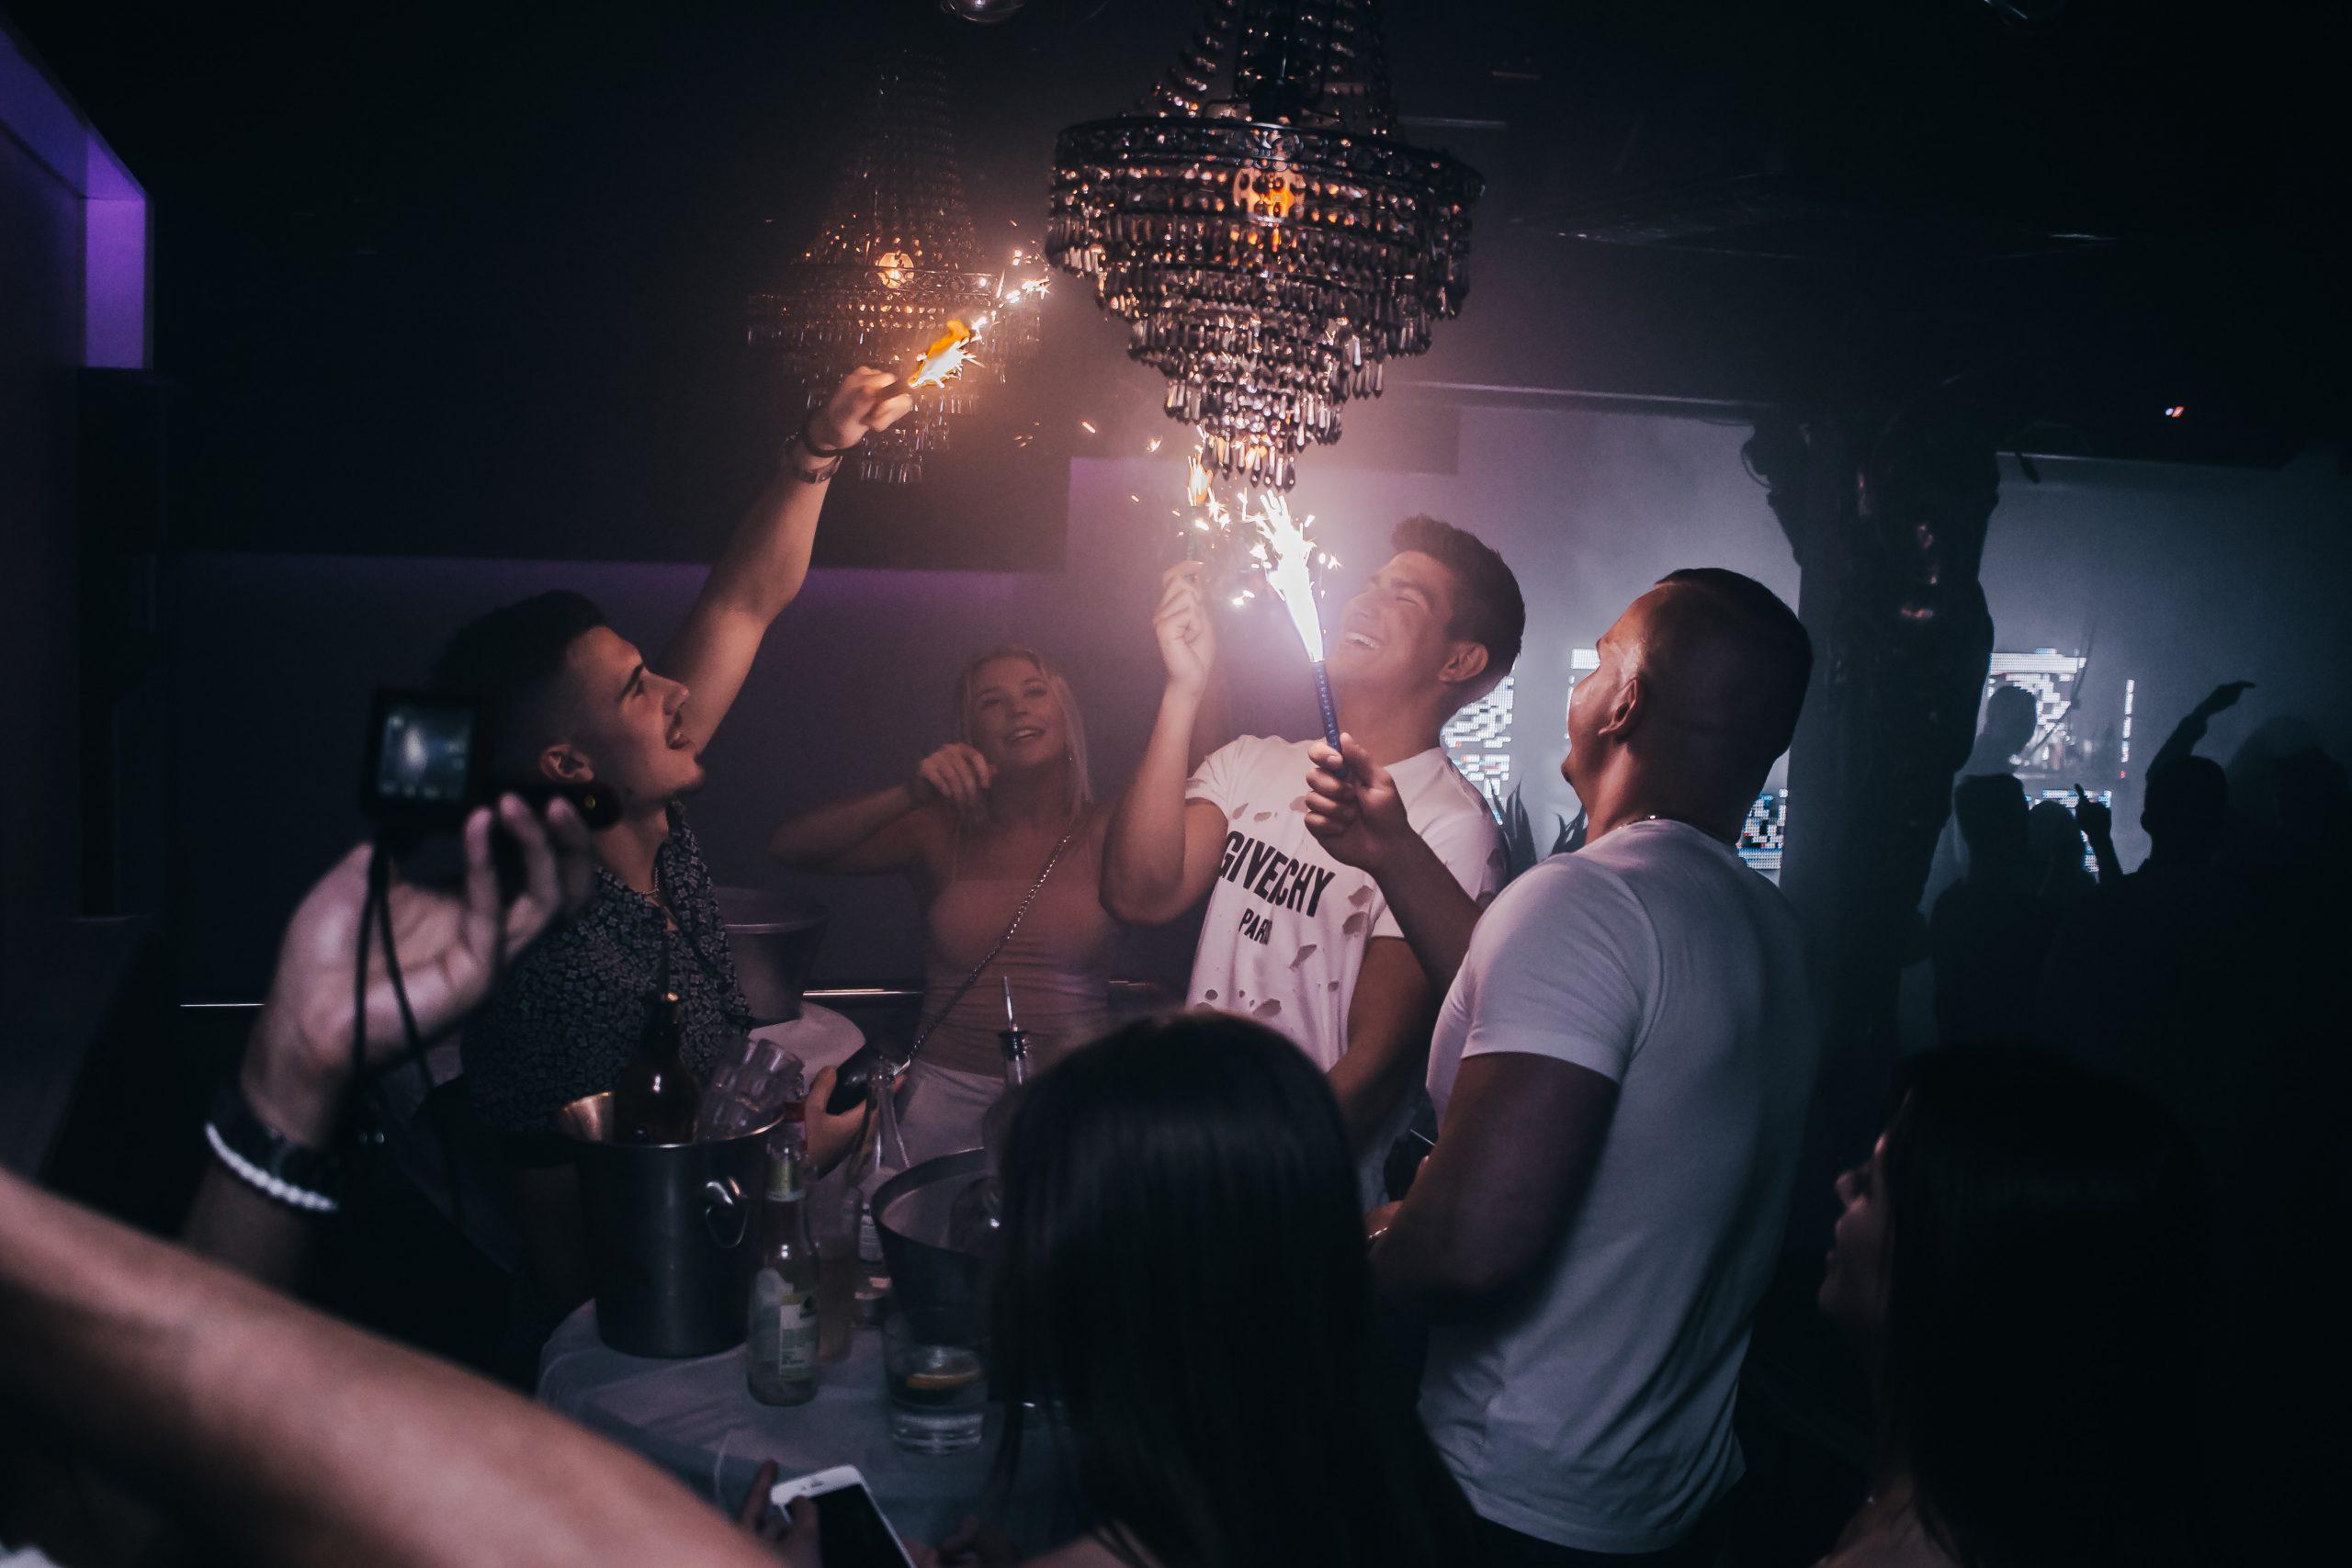 Junggesellenabschied Party jga Stag Bachelor party kiev Kiew quad krass Ideen günstig Party Junggesellen abschied